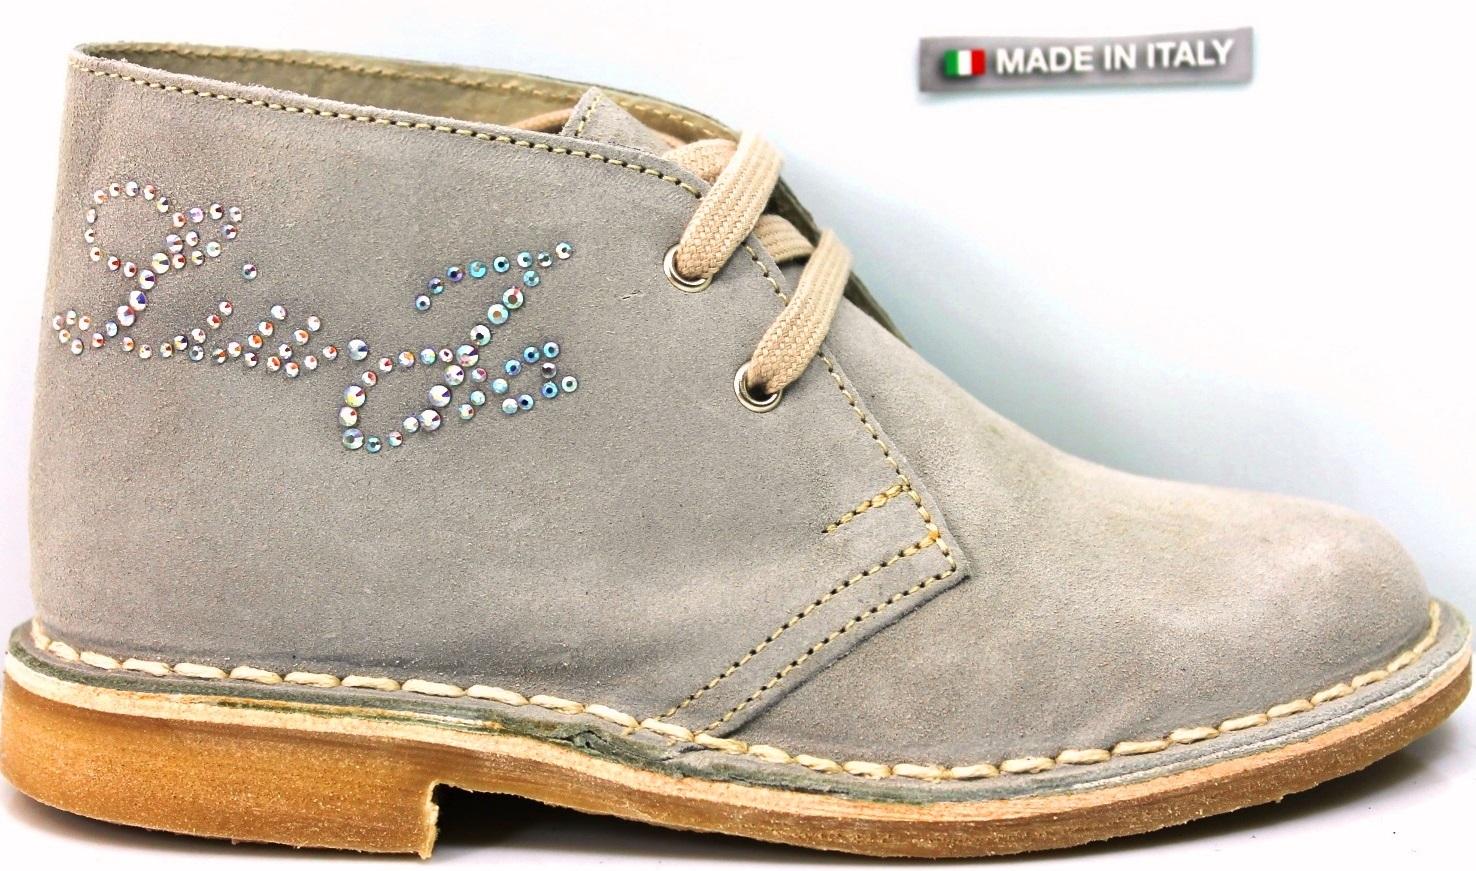 Polacco Camoscio LIU JO Scarpe Donna Bambina Calzature Woman Shoes. codice   LiuJo20353silver eb15c0cd198